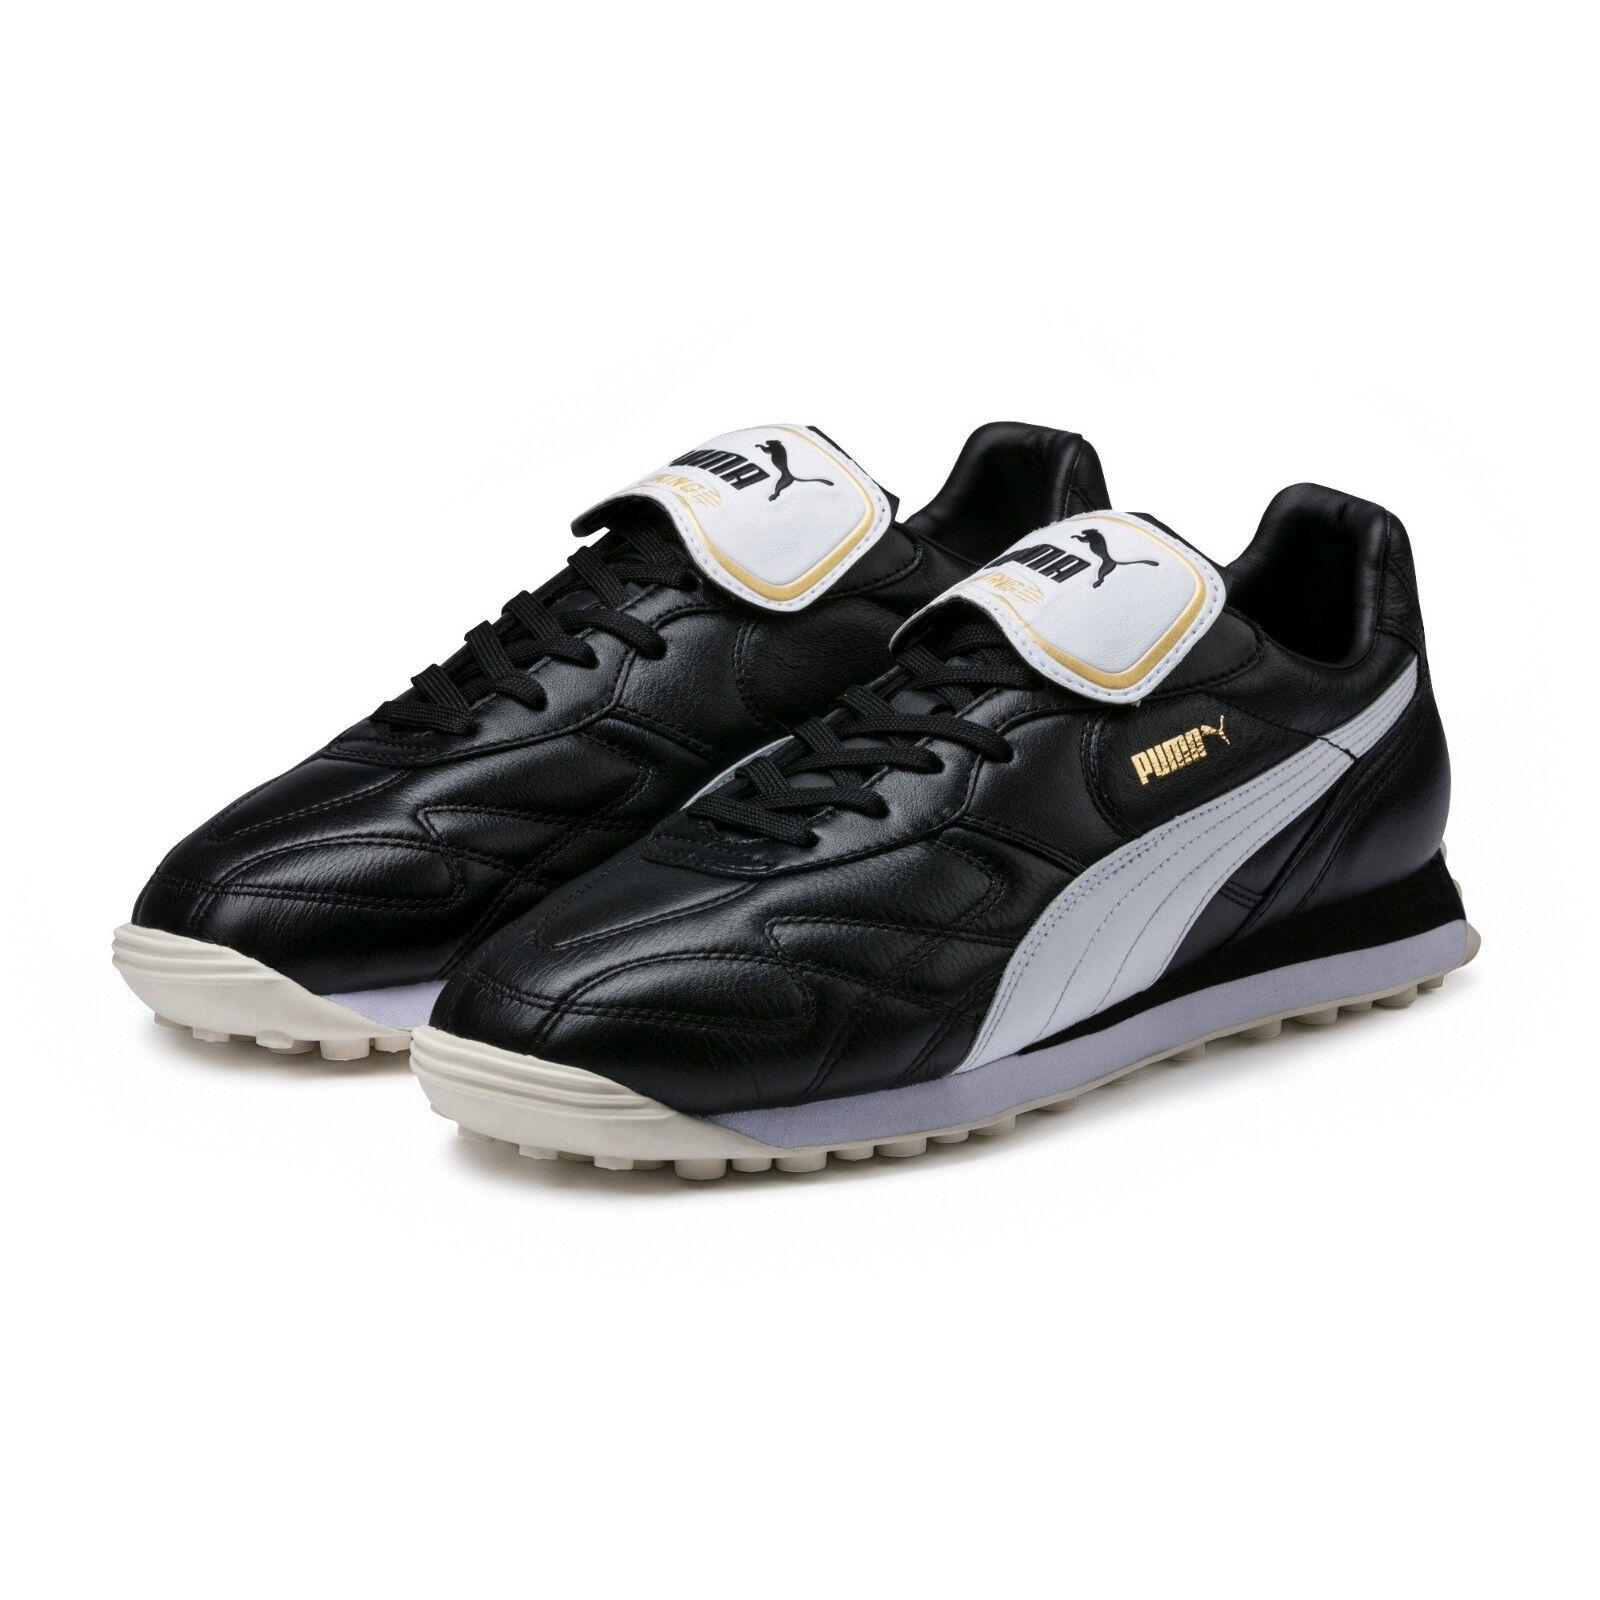 Puma King Avanti Premium Mens Leather Sneakers Black White Size 9.5